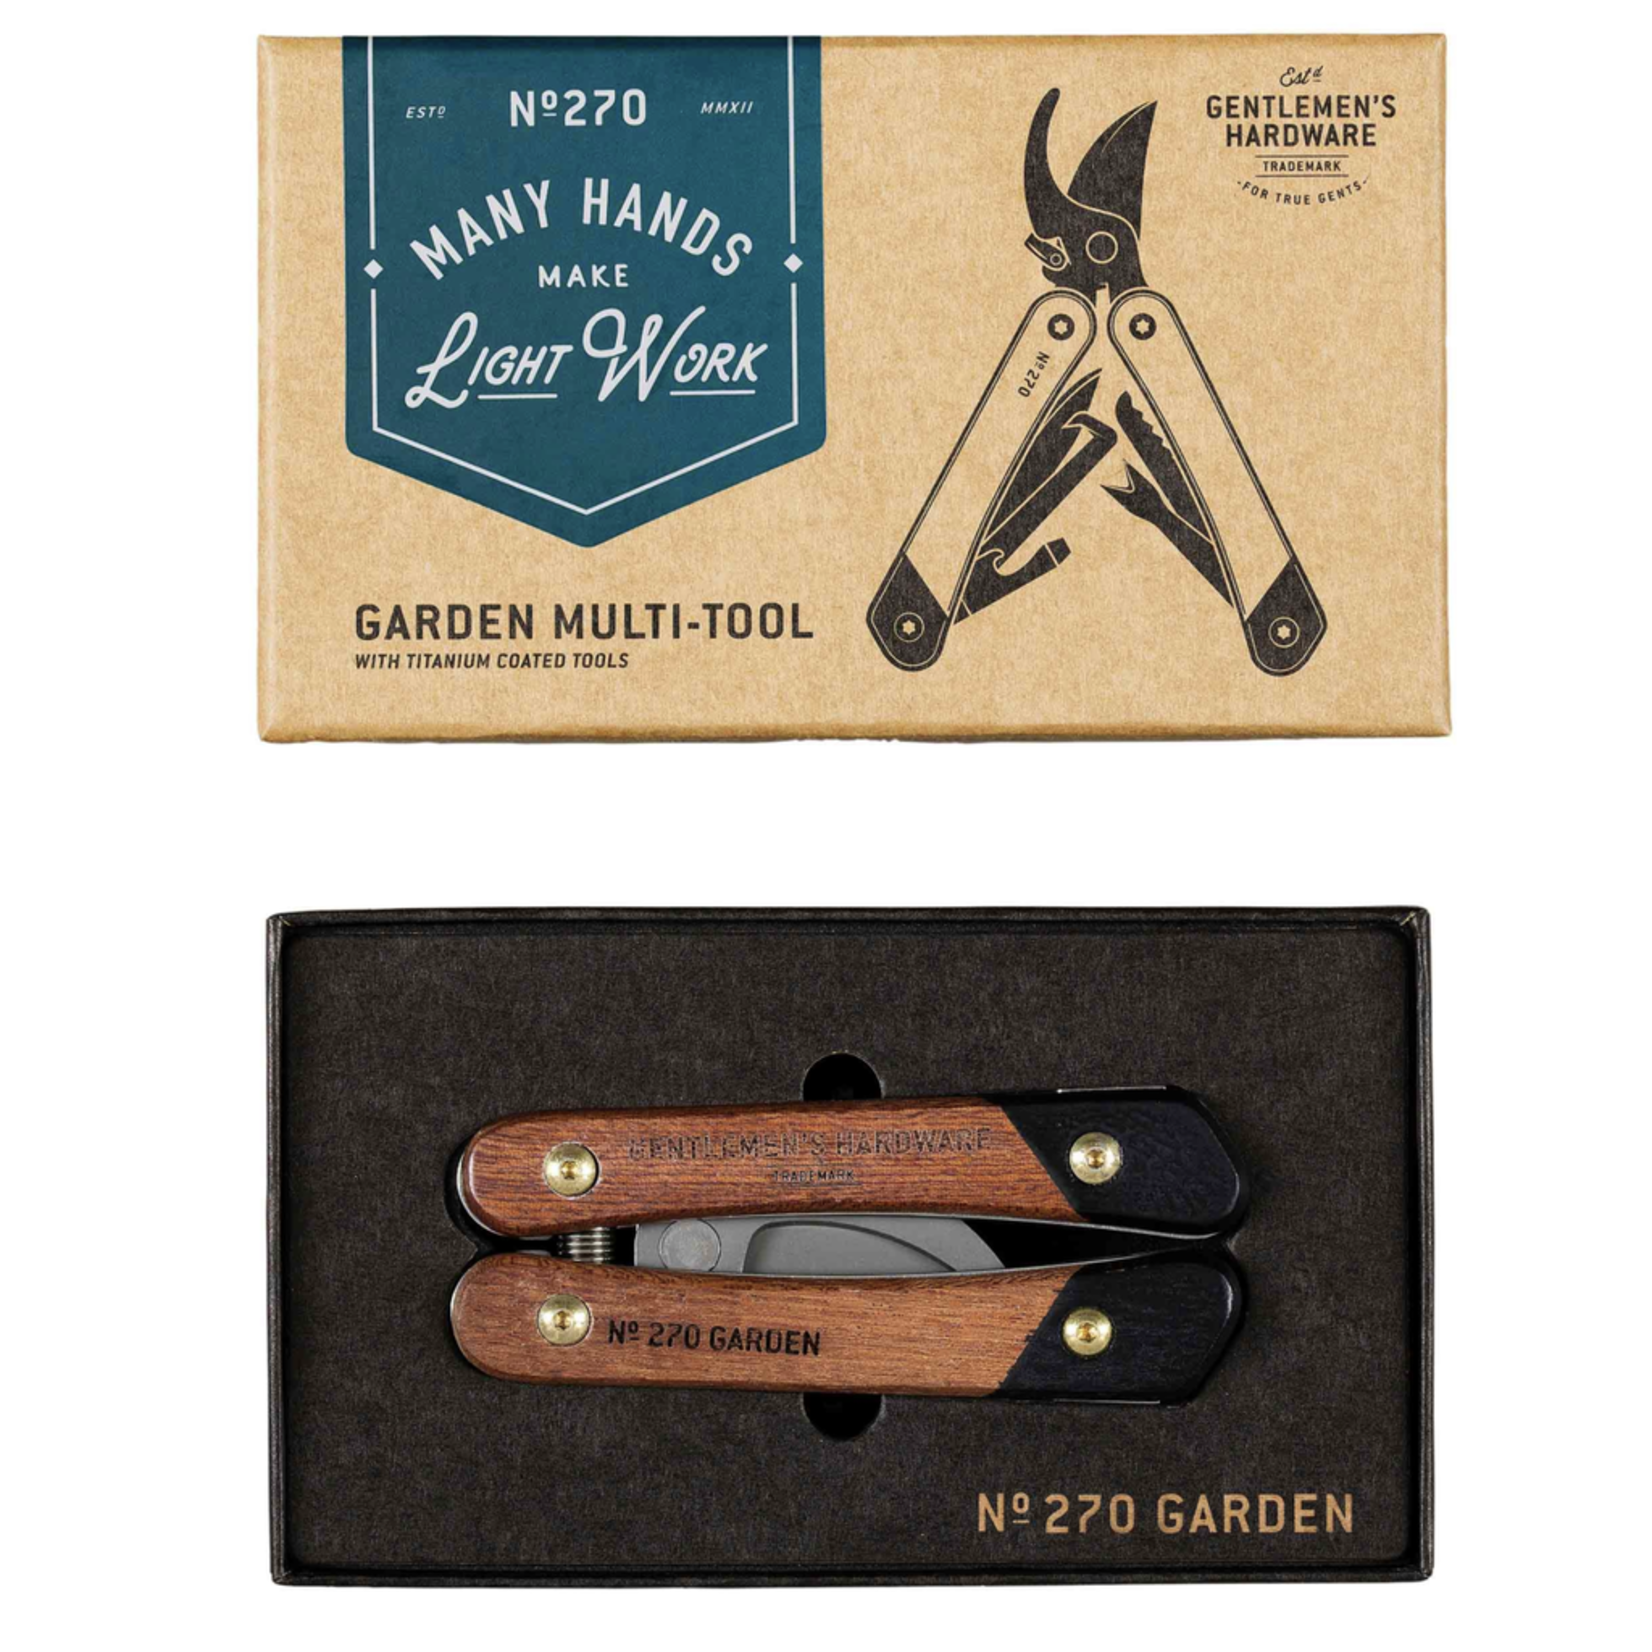 Gentlemen's Hardware Gentlemen's Hardware Garden Multi-Tool Wood Handles & Titanium Finish